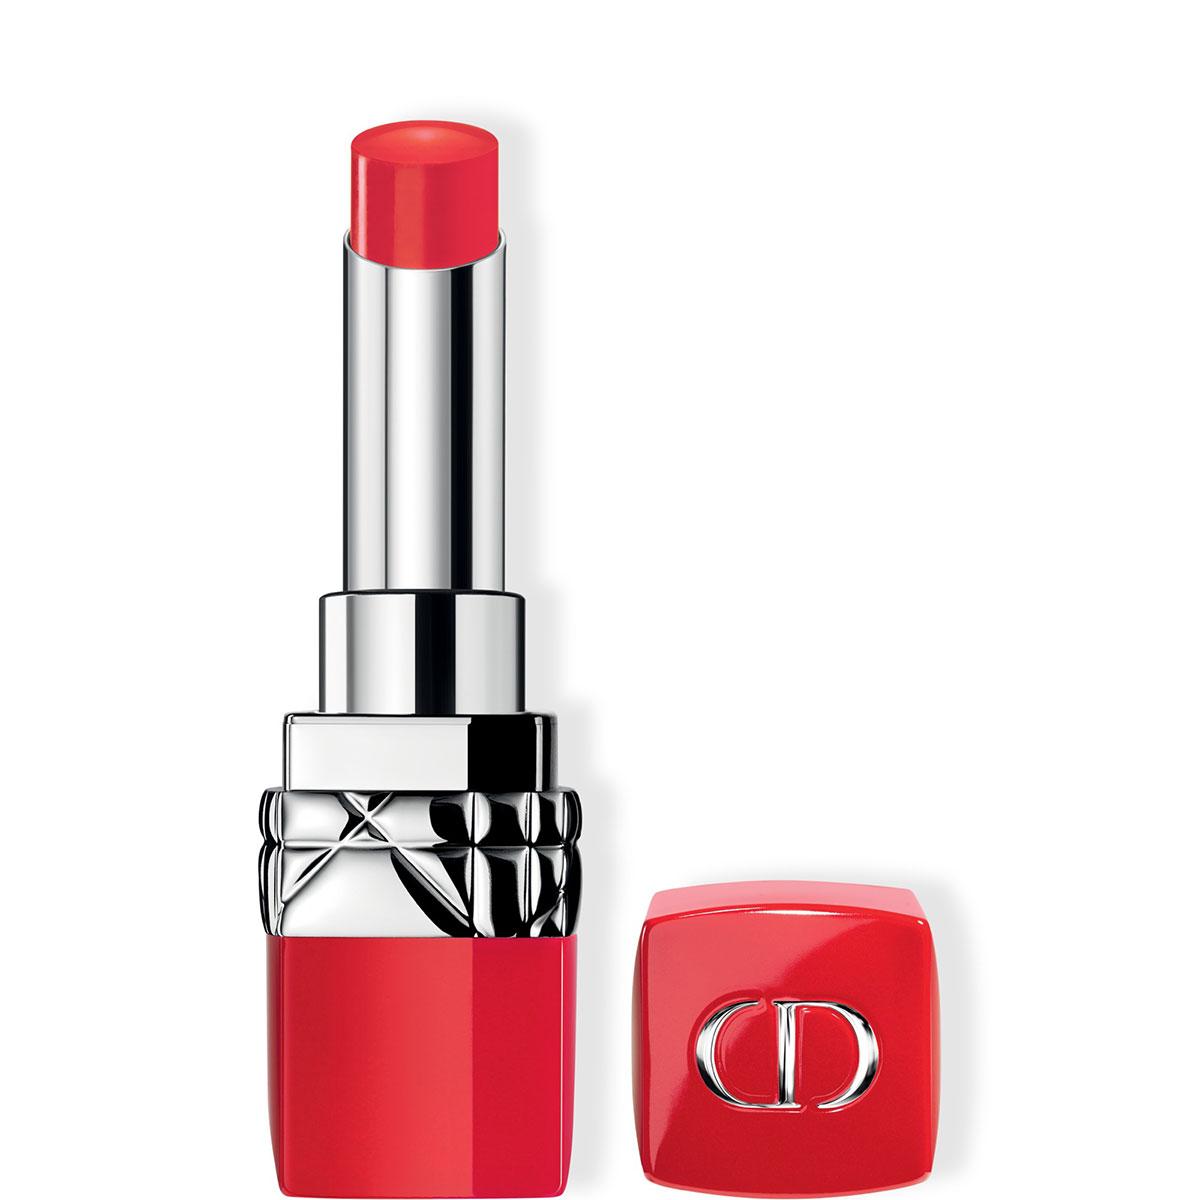 Rouges à lèvres Rouge Dior Ultra Rouge - DIOR